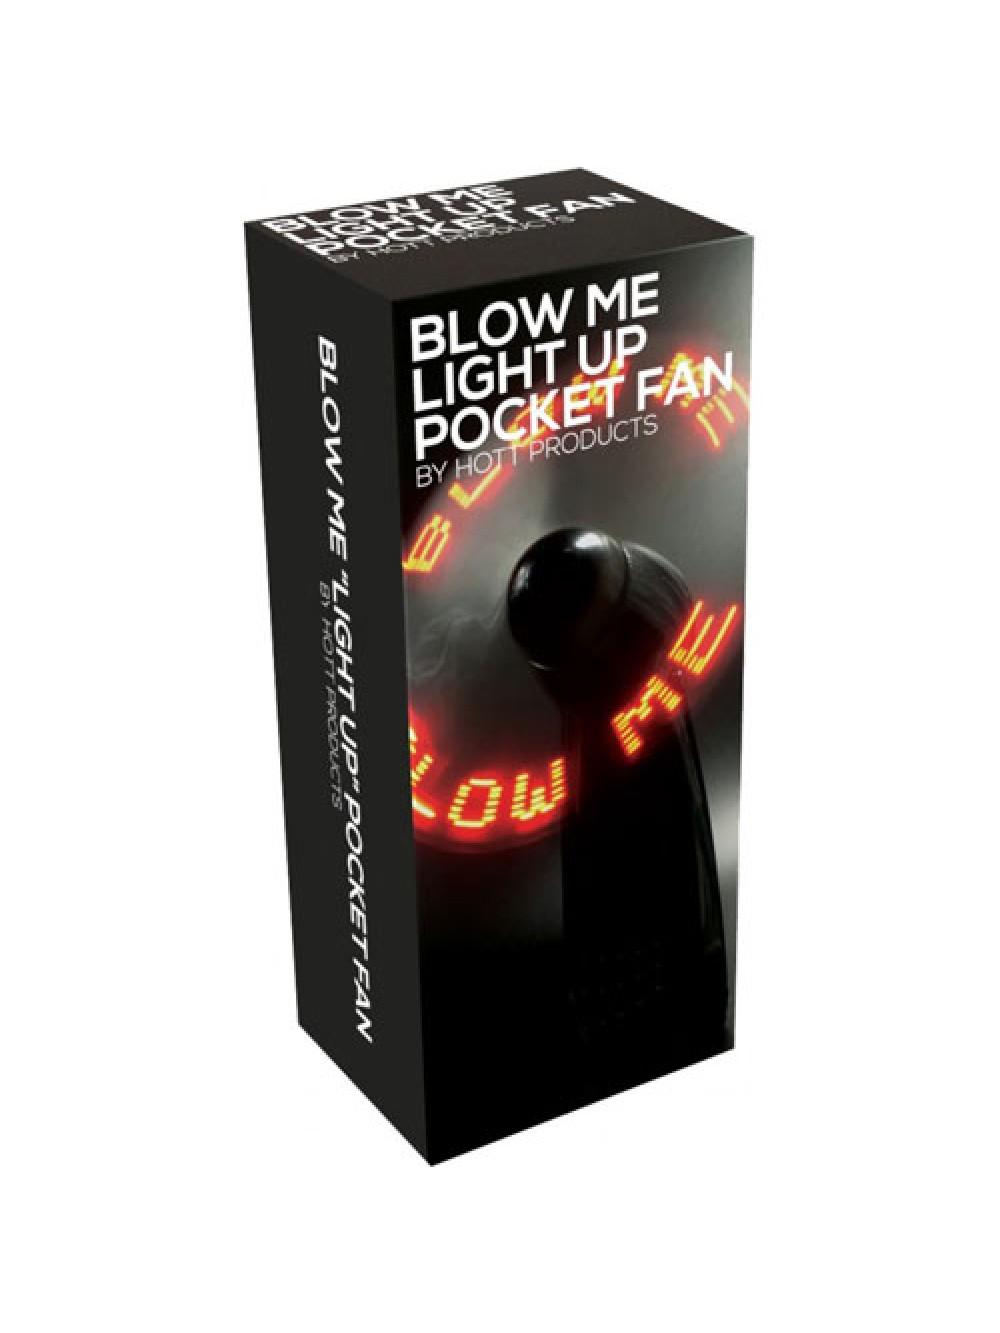 Blow Me Light Up Pocket Fan Black